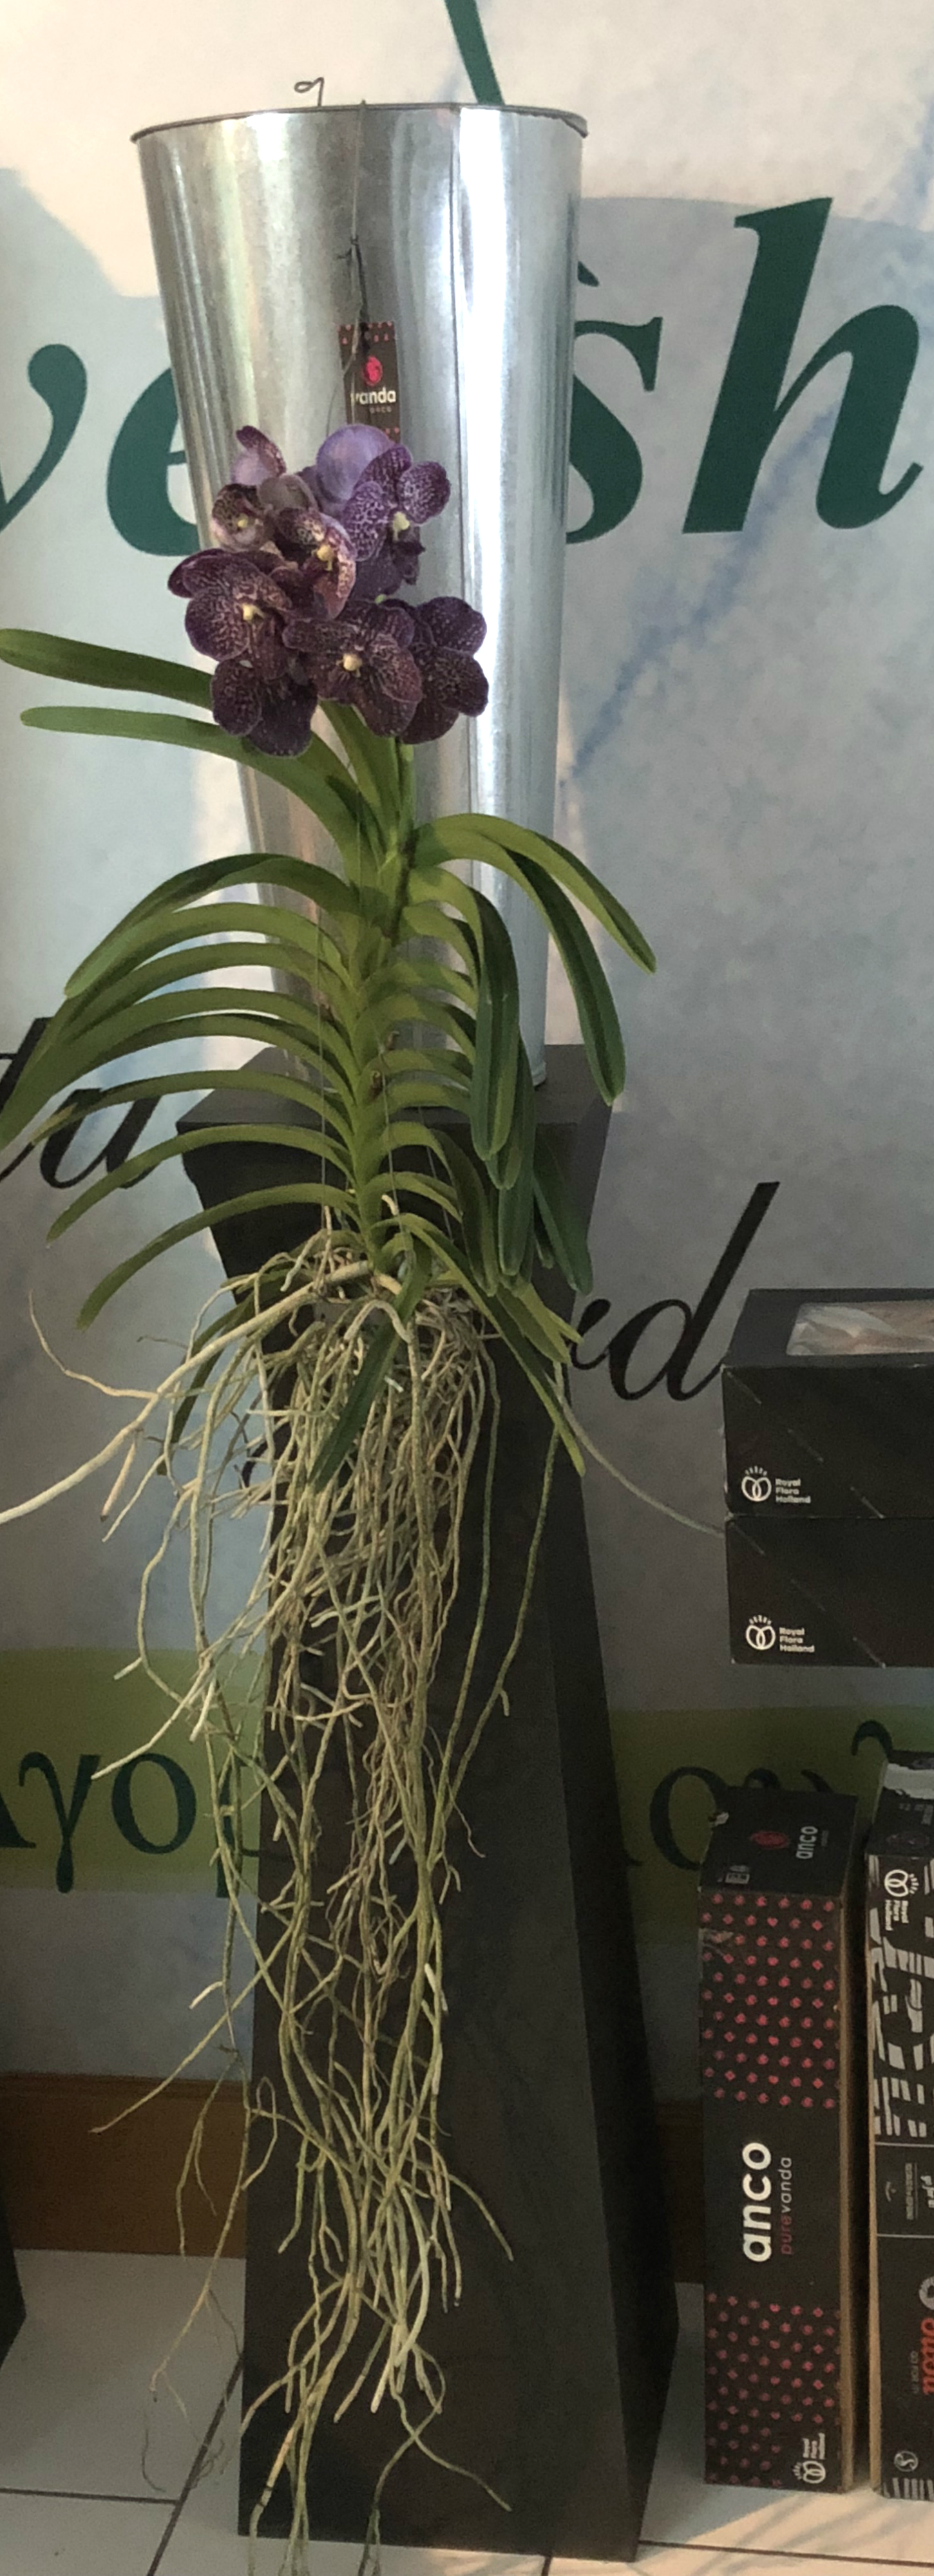 Vanda Orchid In Gl Vase